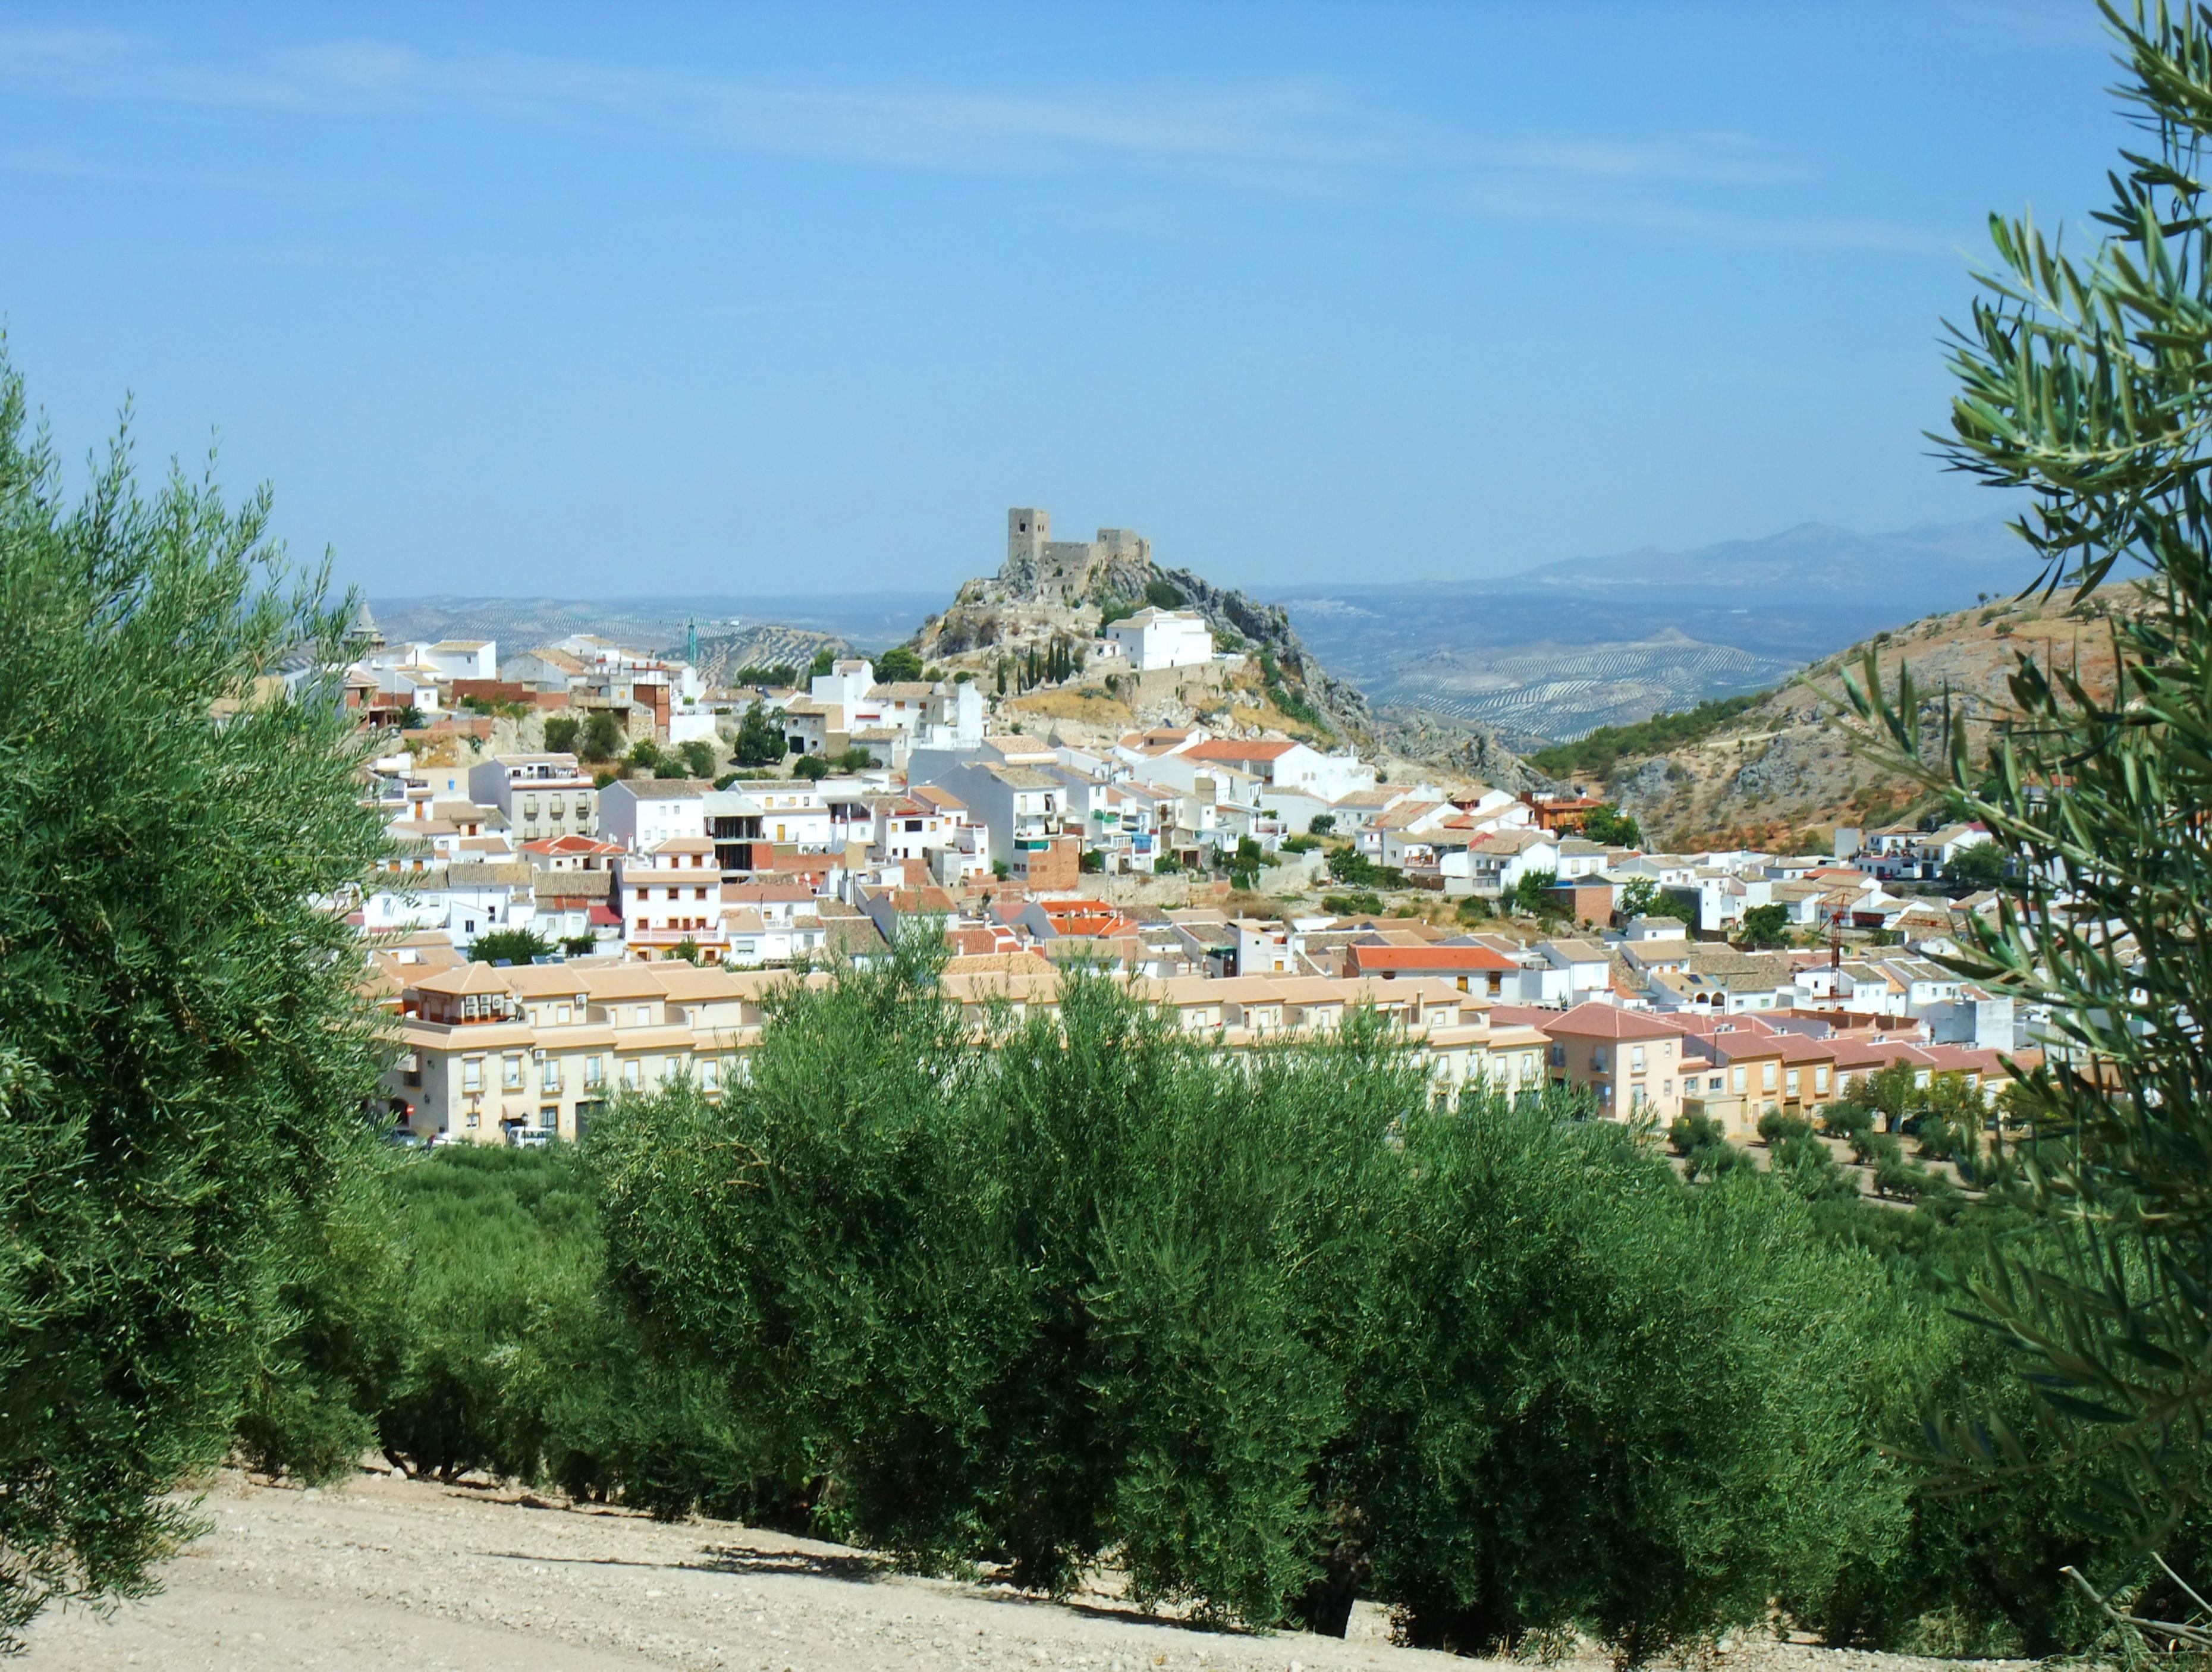 Luque (Spagna)